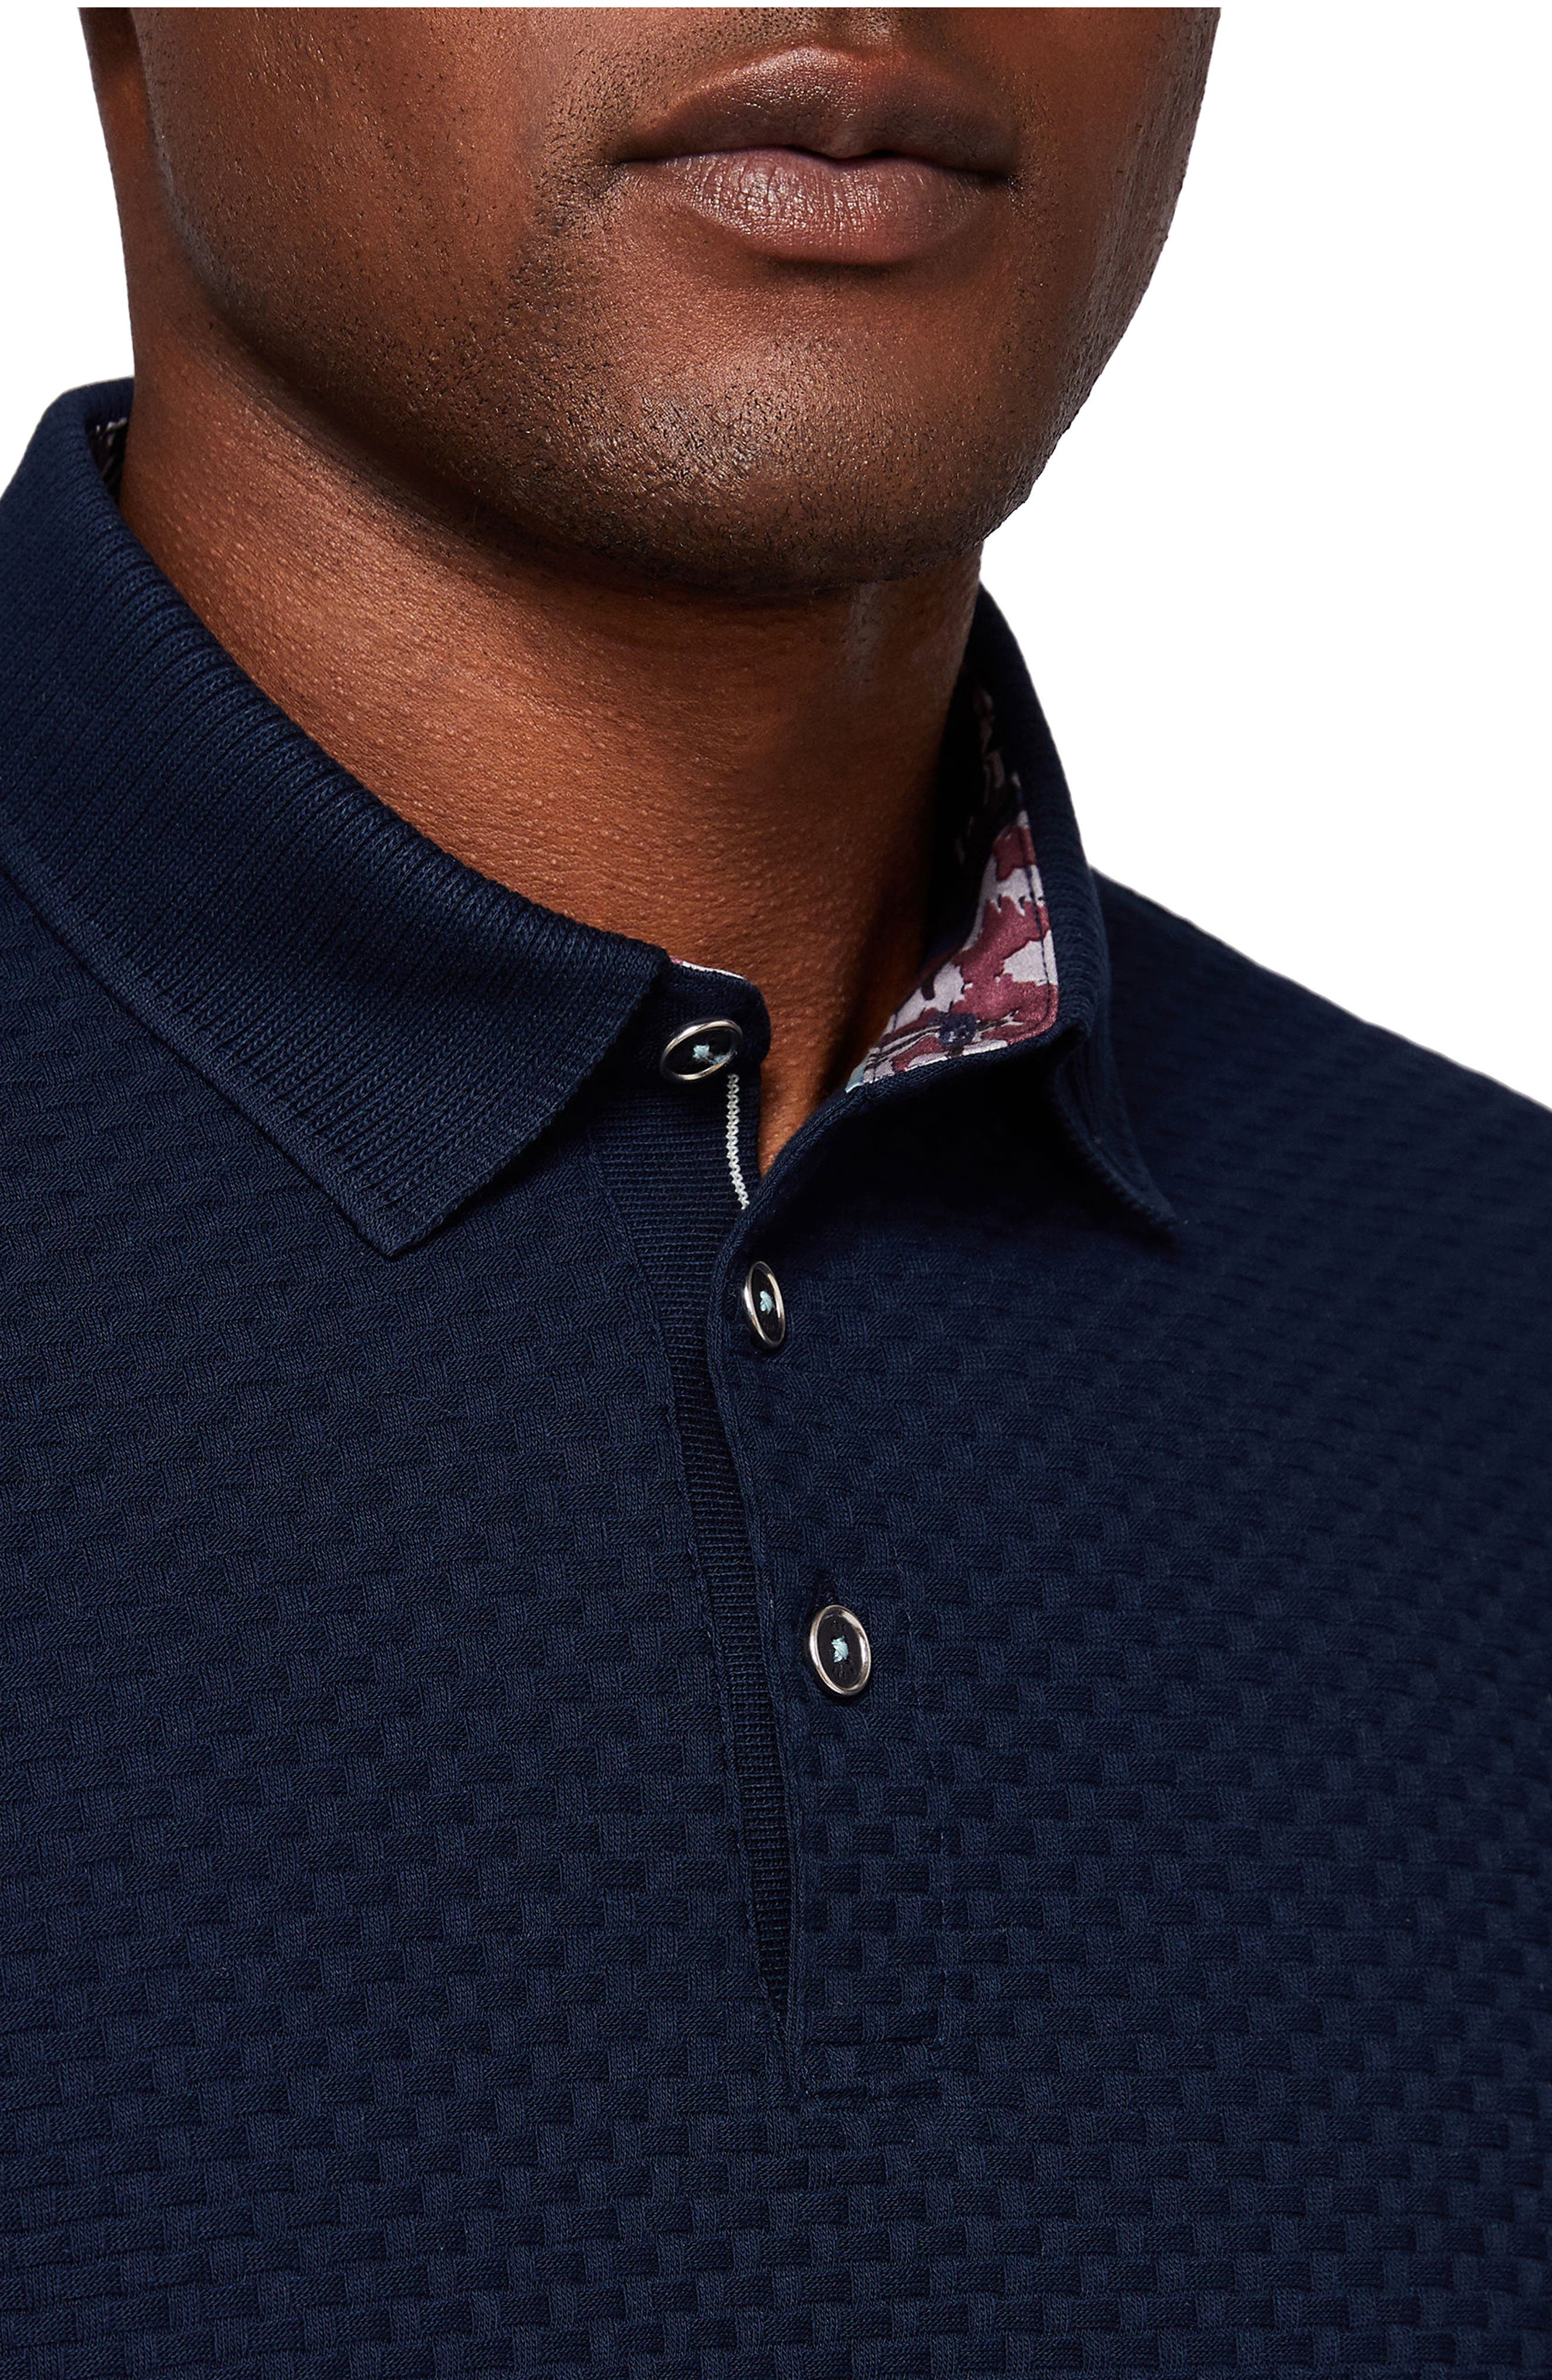 Eskimtt Polo Shirt,                             Alternate thumbnail 3, color,